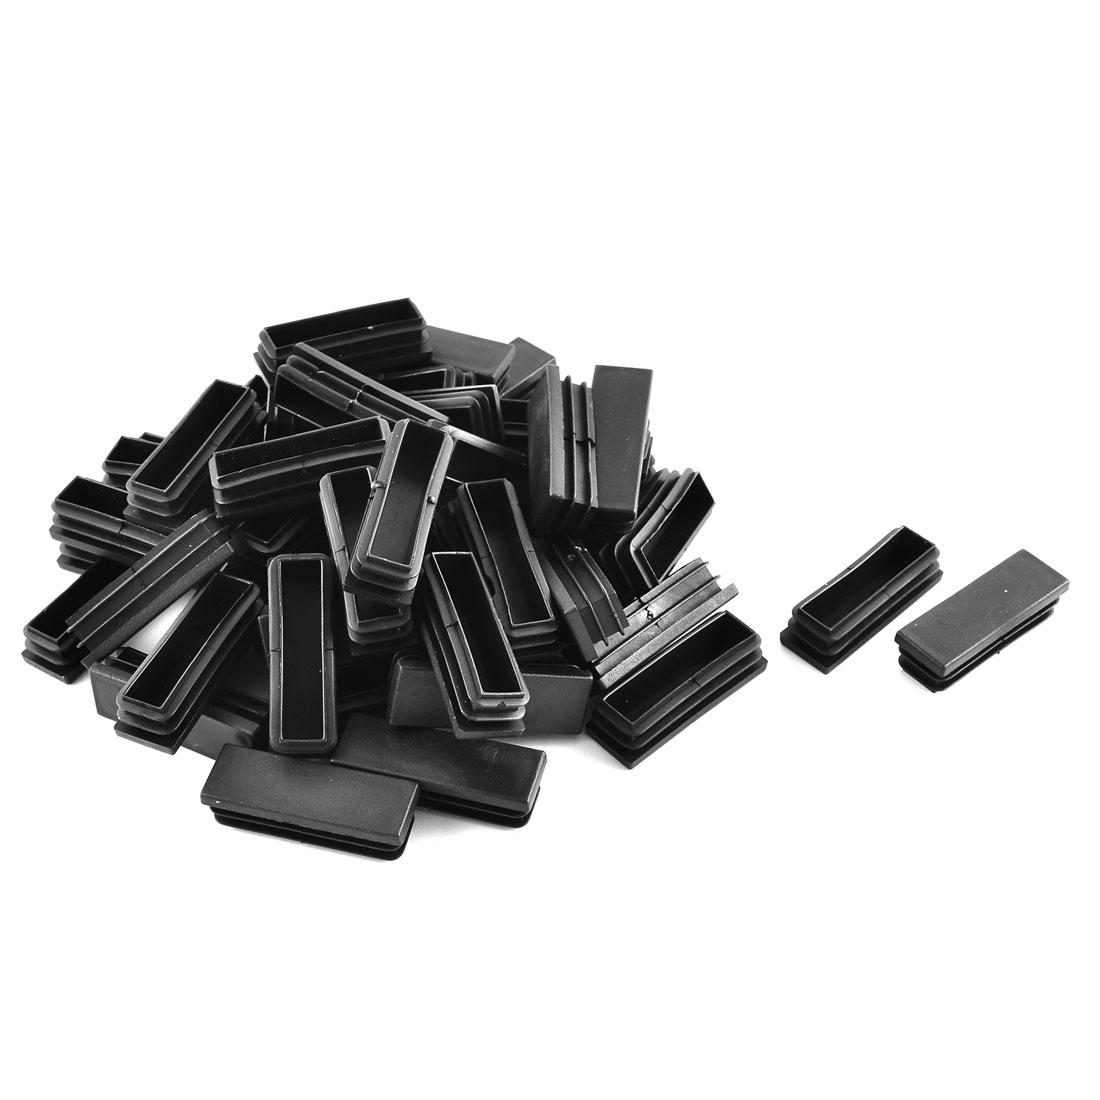 Plastic Rectangle Tube Inserts End Blanking Cap Black 20mm x 60mm 50 Pcs